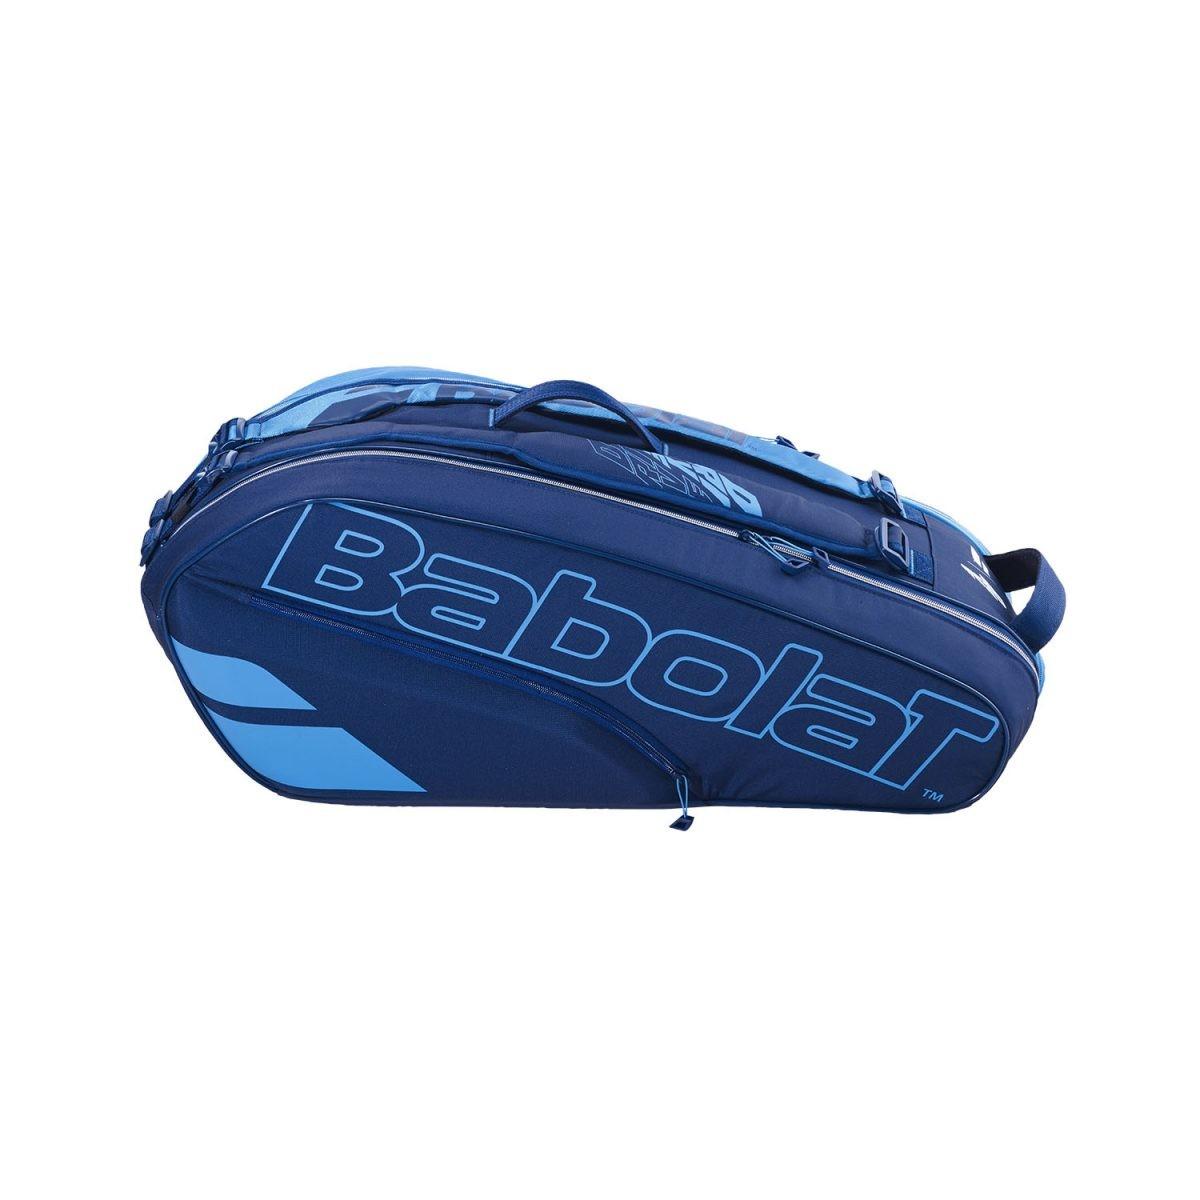 Raqueteira Babolat RH X6 Pure Drive 2021